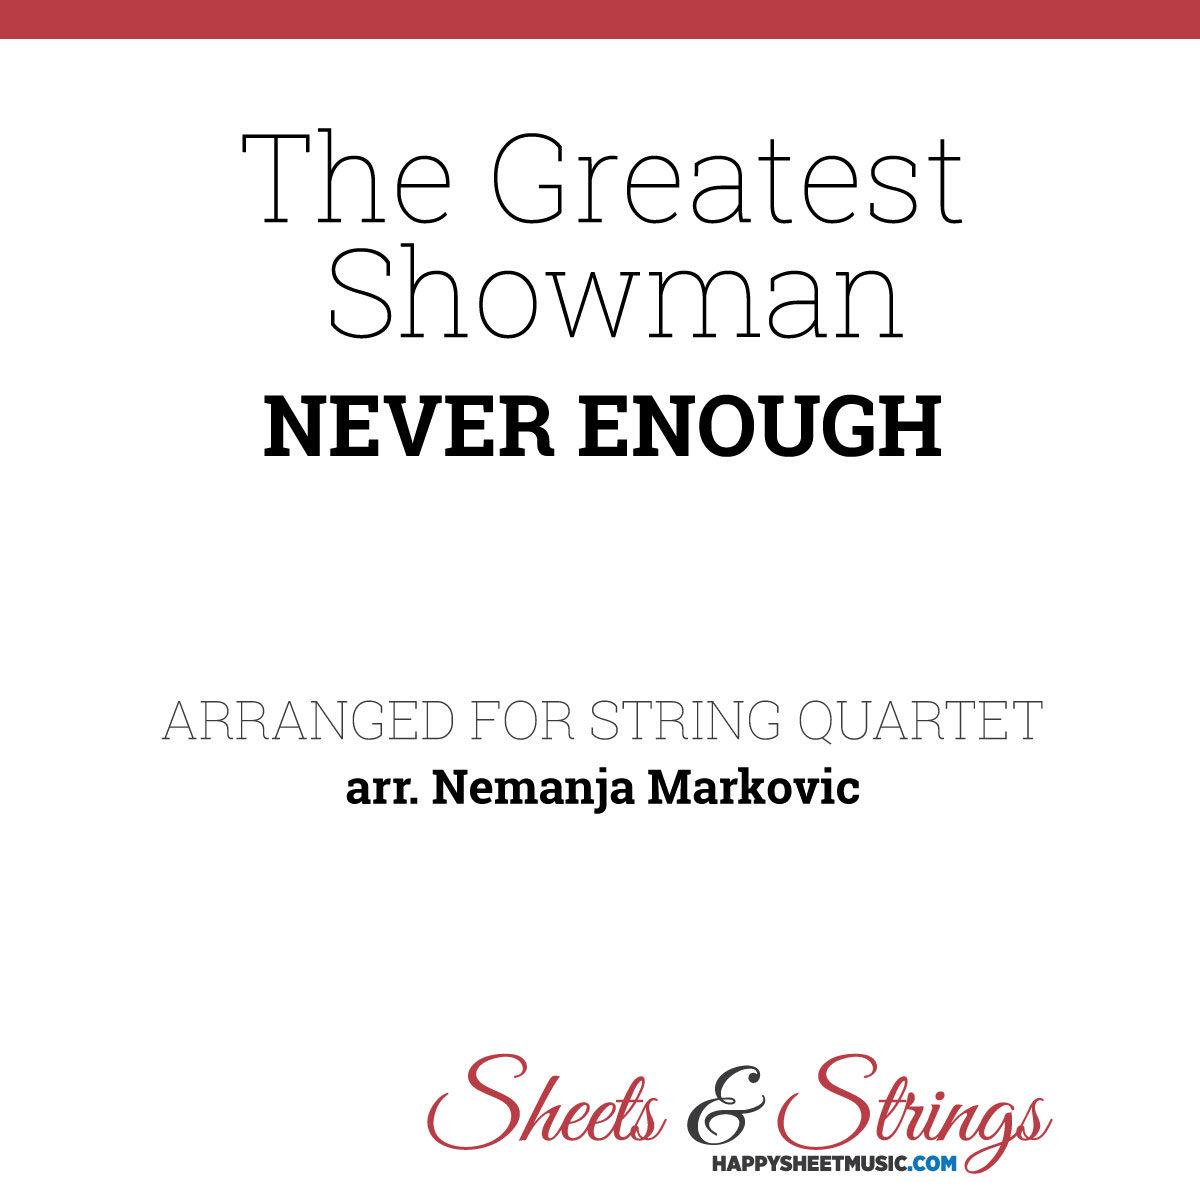 The Greatest Showman - Never Enough - Sheet Music for String Quartet - Music Arrangement for String Quartet